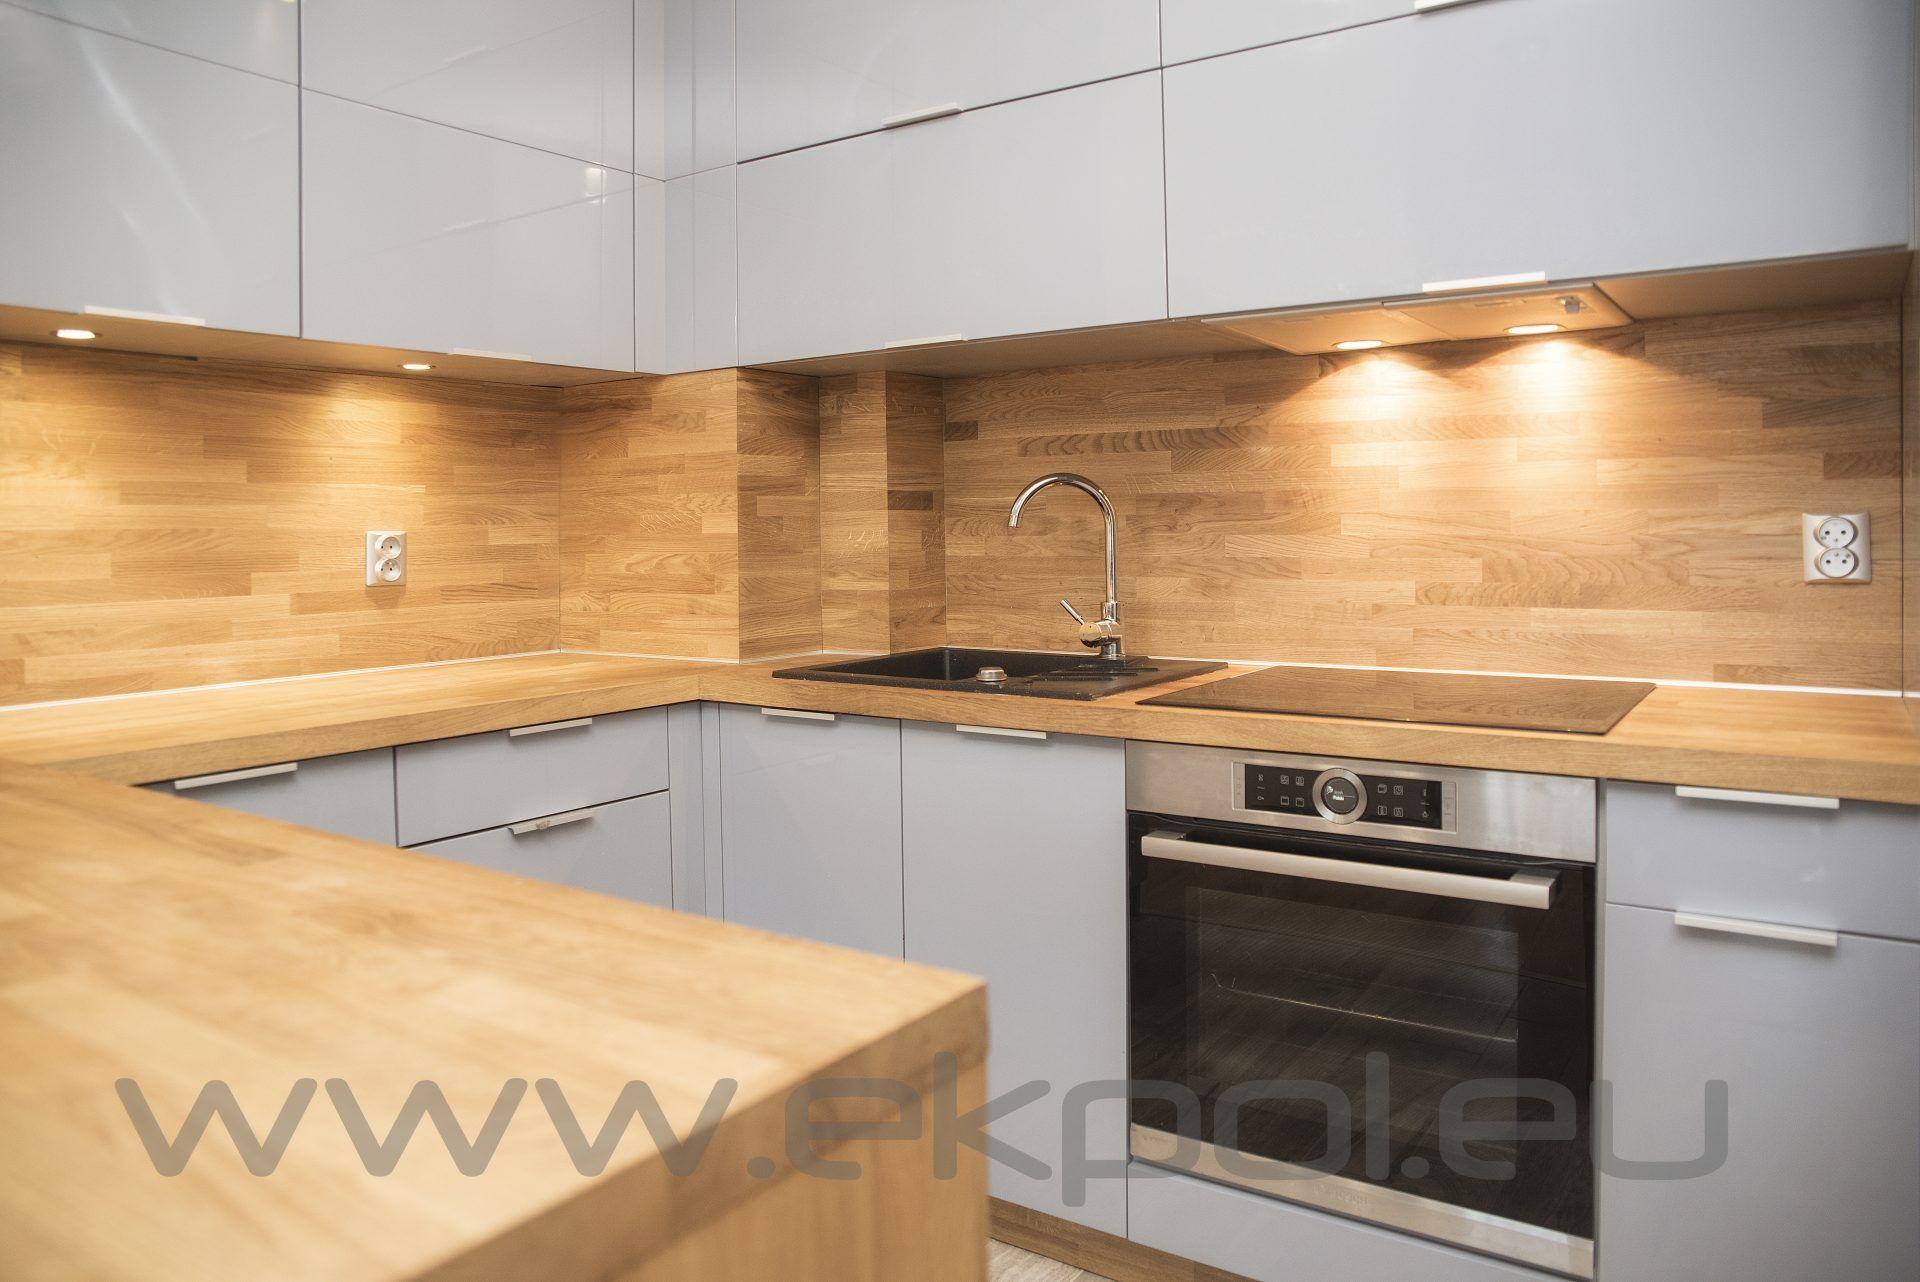 Ekpol Reda Producent Mebli Kuchennych Meble Kuchenne Na Wymiar Kuchnie Kitchen Cabinets Kitchen Home Decor